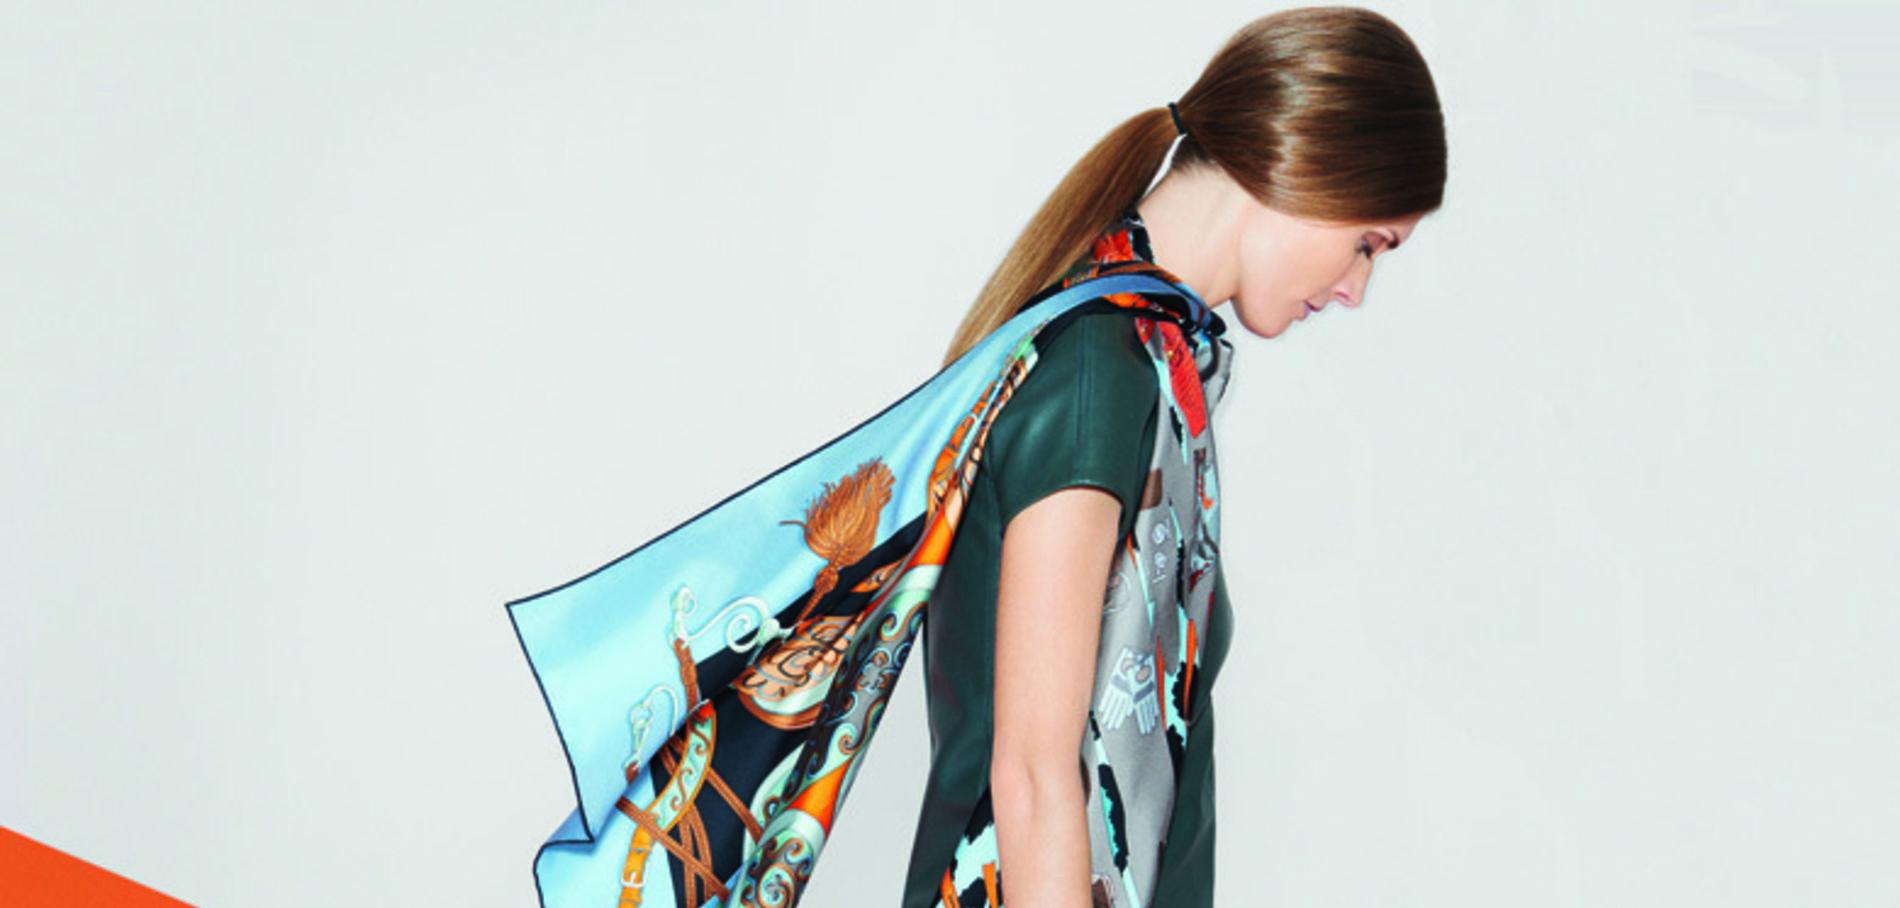 Appli-mode-Hermes-nous-apprend-l-art-du-foulard_exact1900x908_l